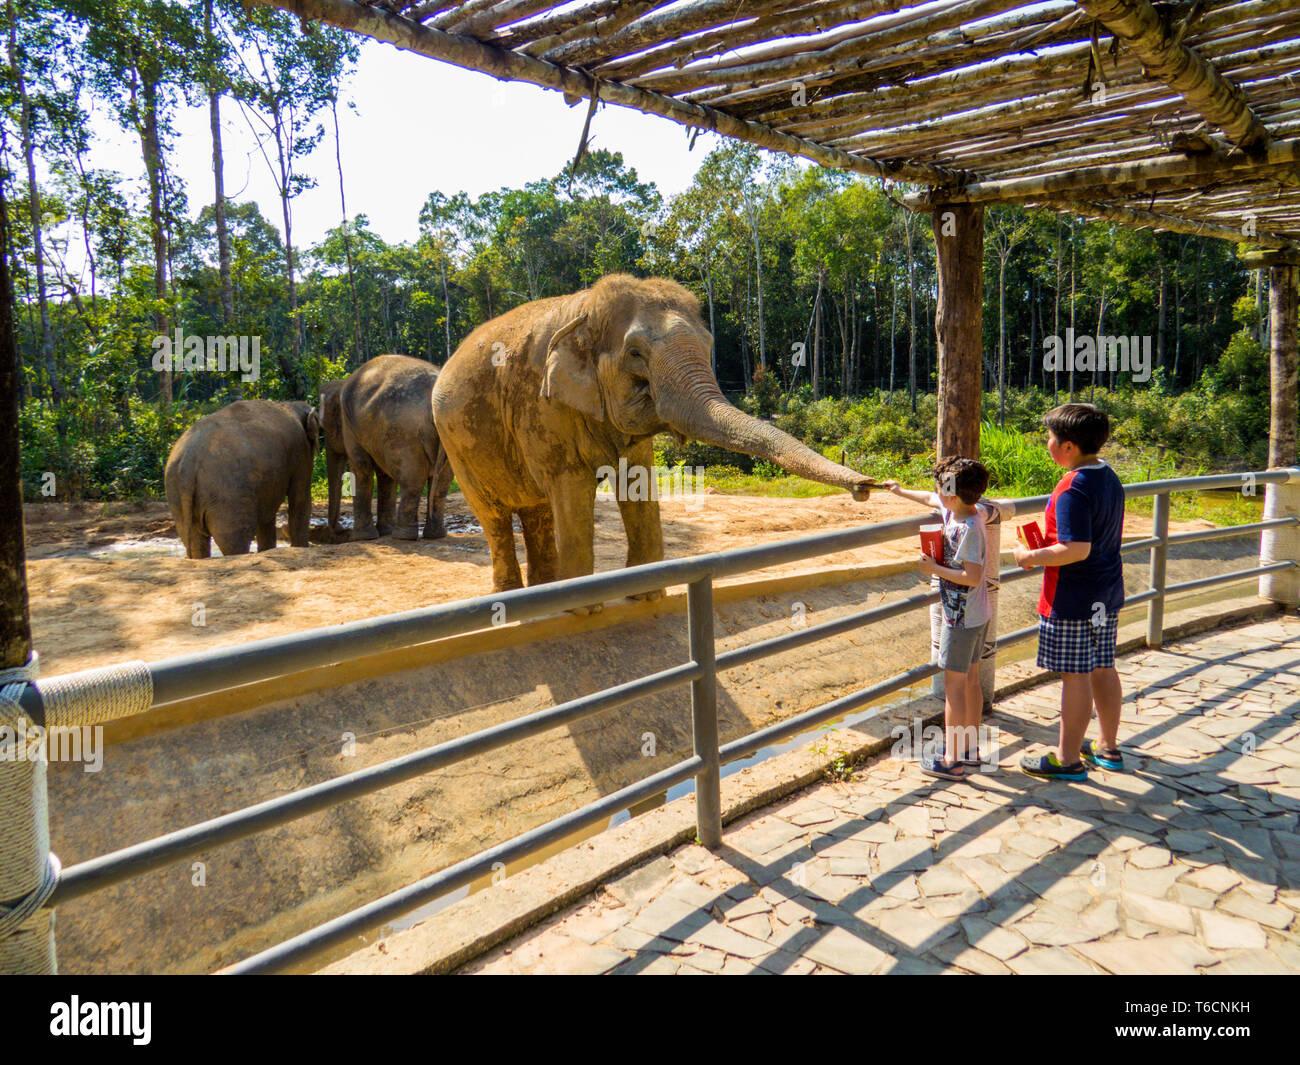 PHU QUOC, VIETNAM - FEBRUARY 12, 2018: Kids feeding Asian elephant in the Vinpearl Safari zoo park. - Stock Image